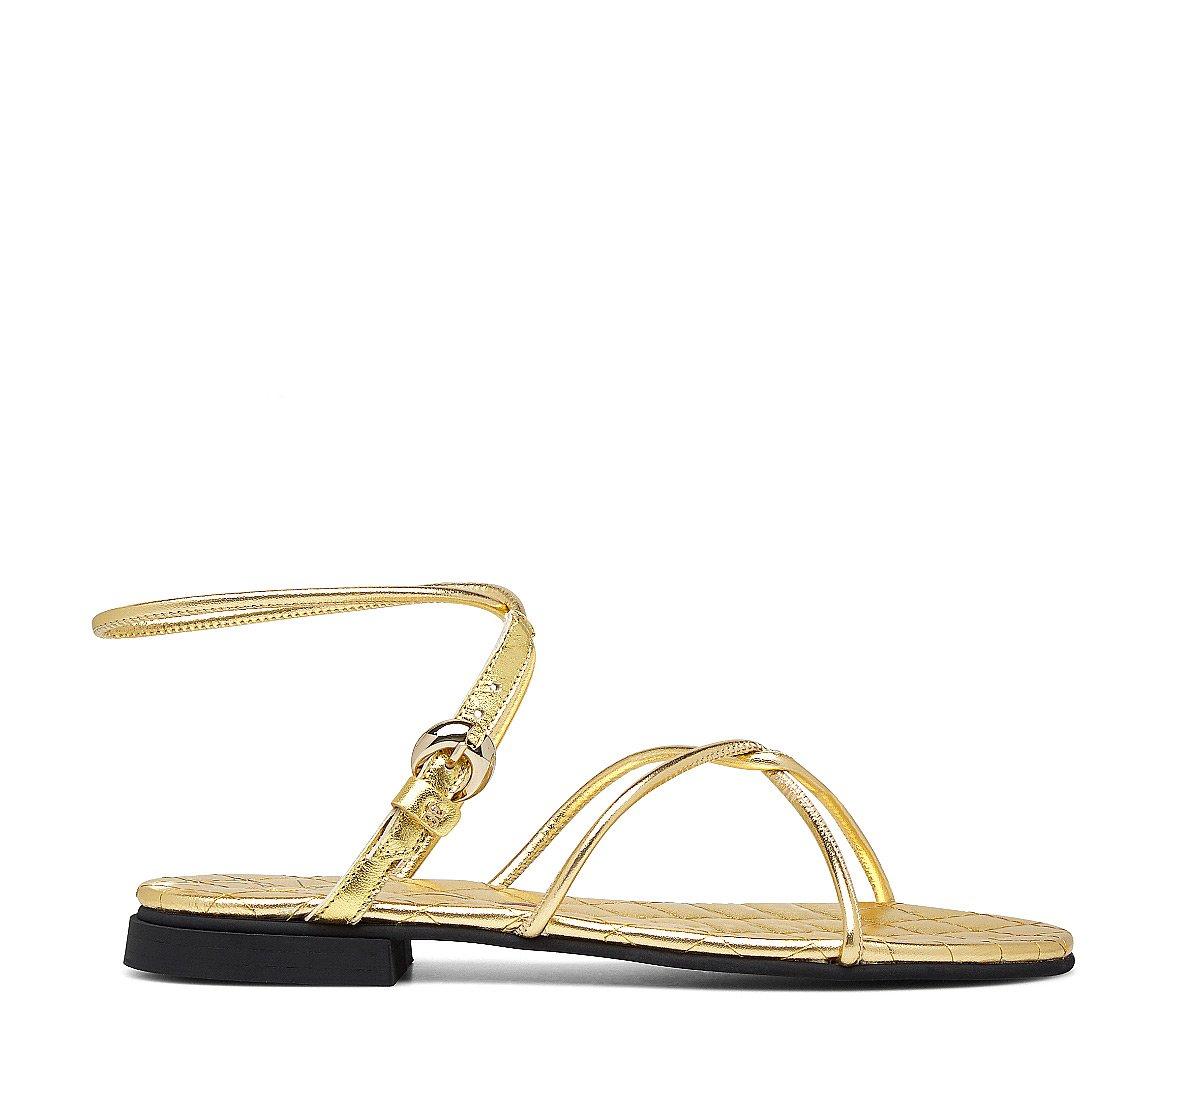 Nappa sandals